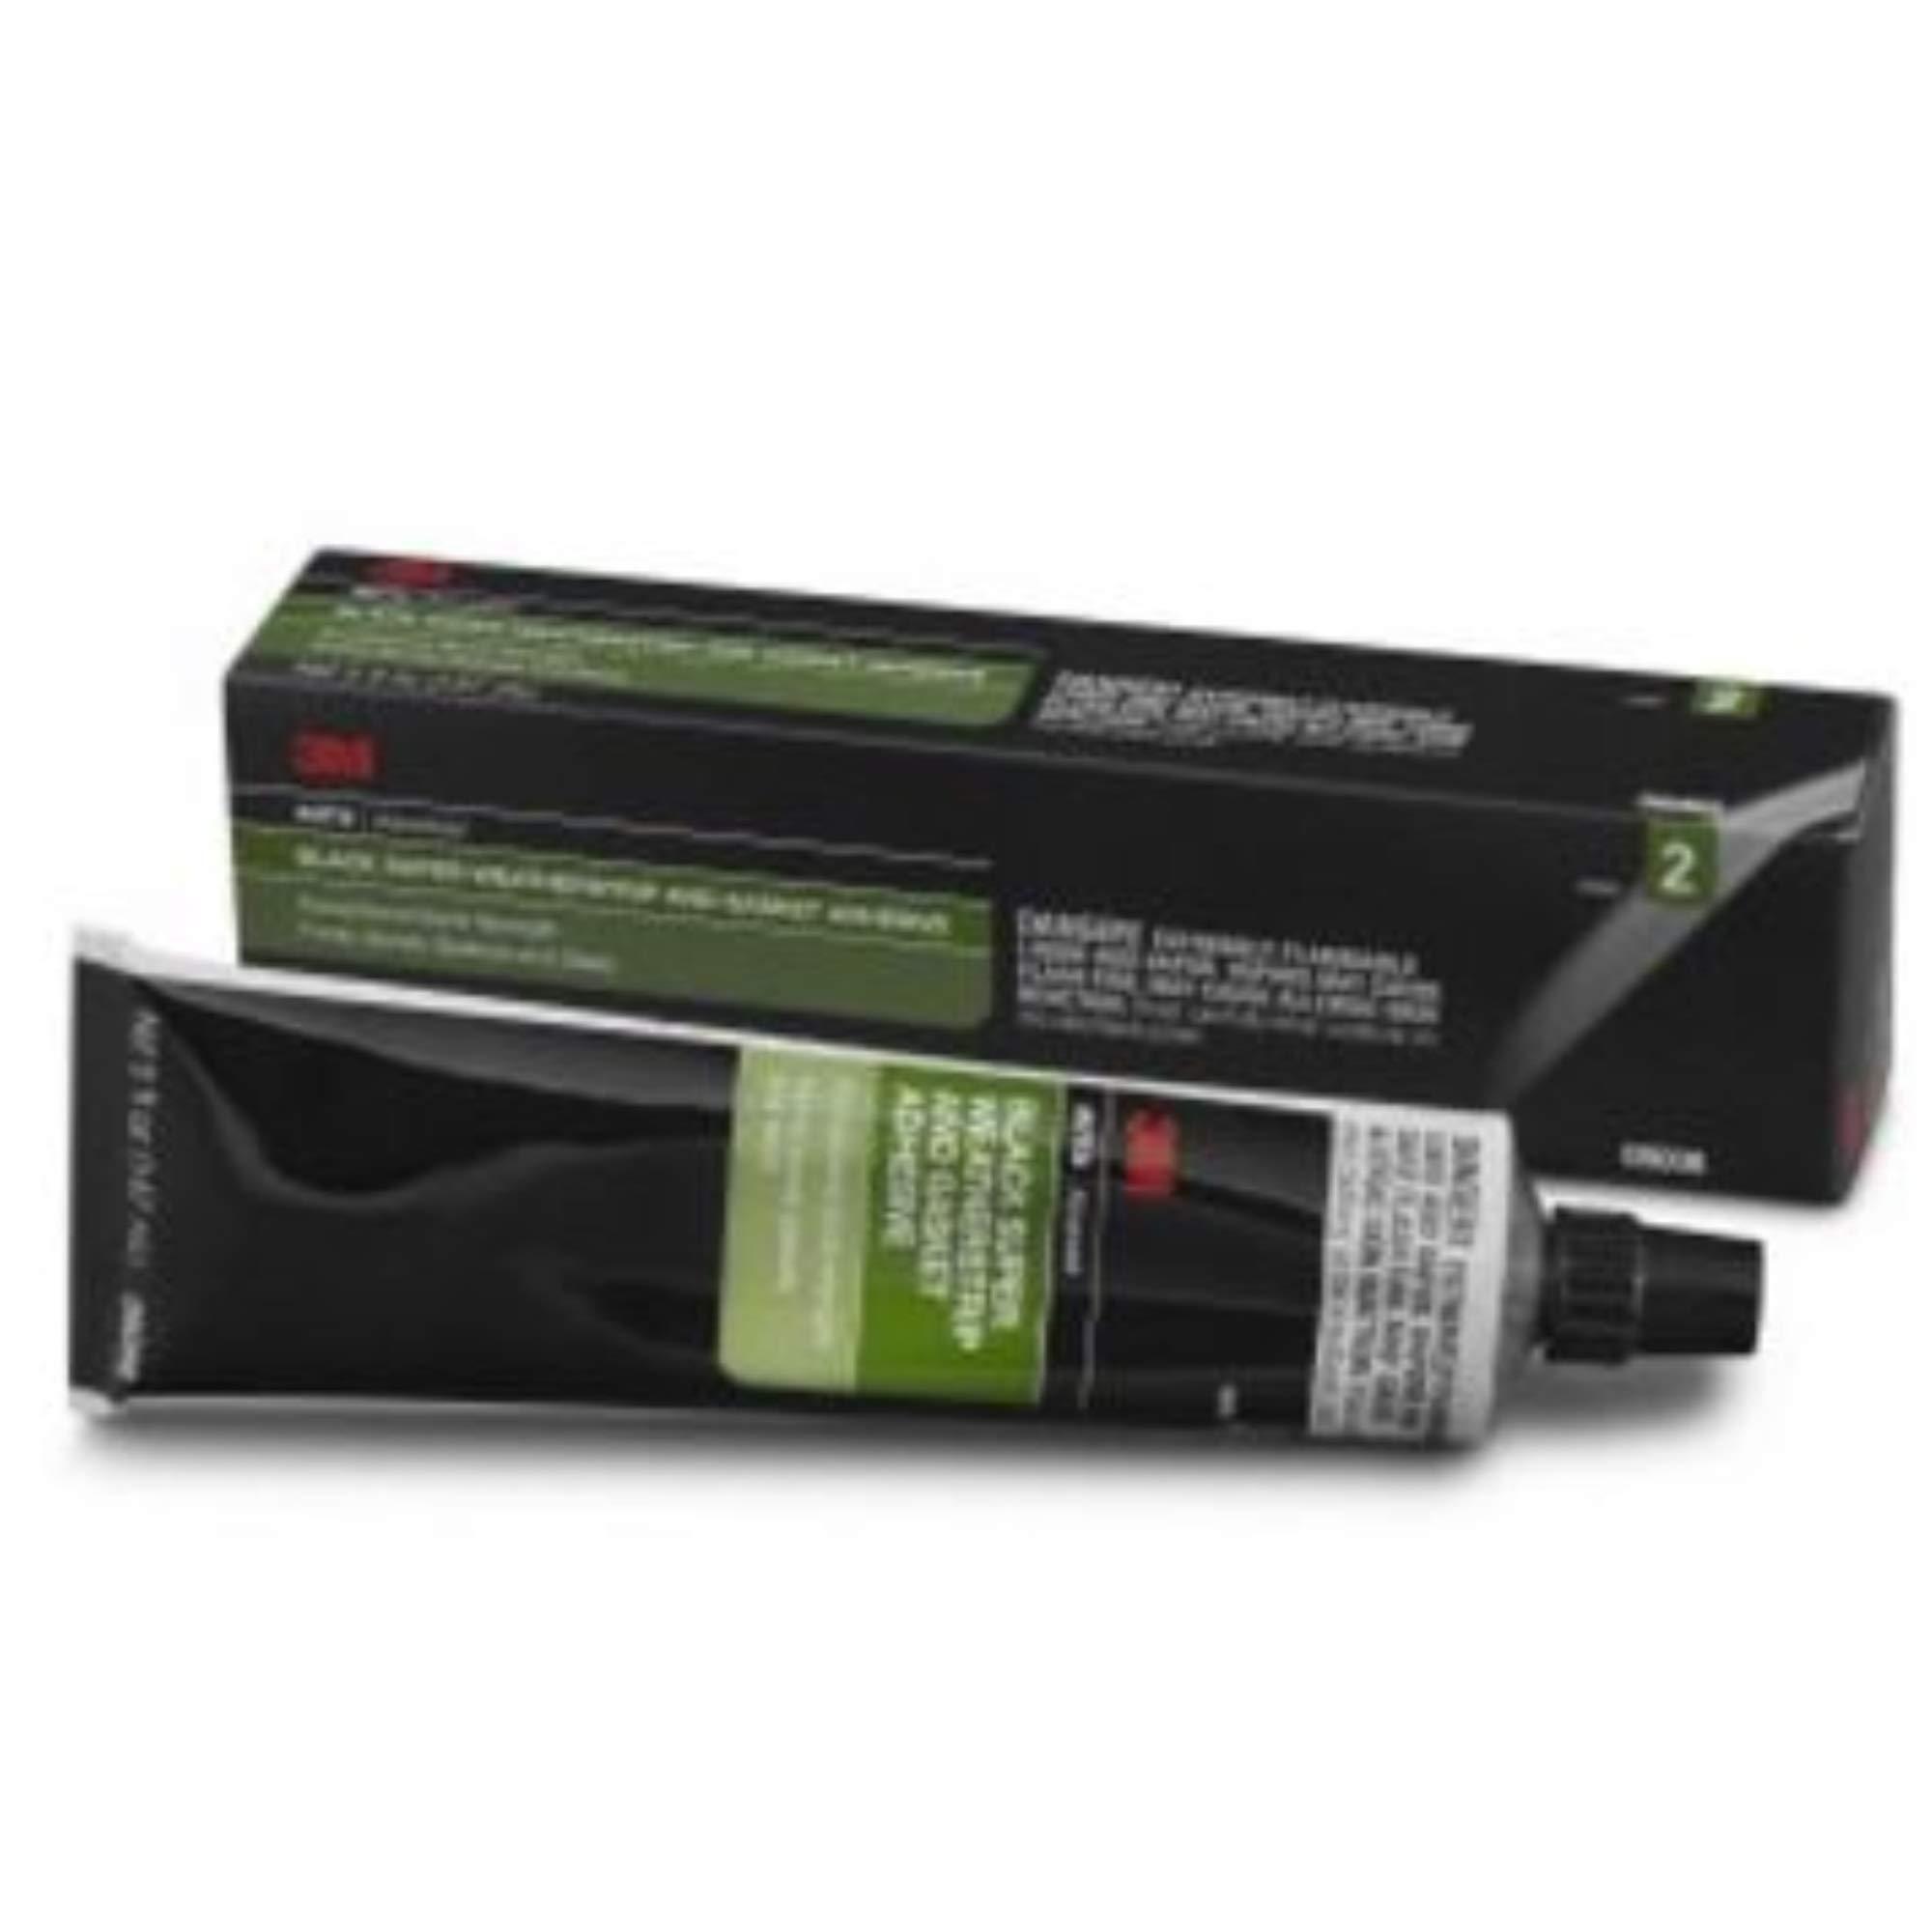 3m Weatherstrip & Gasket Super Adhesive 5oz Tube BLACK